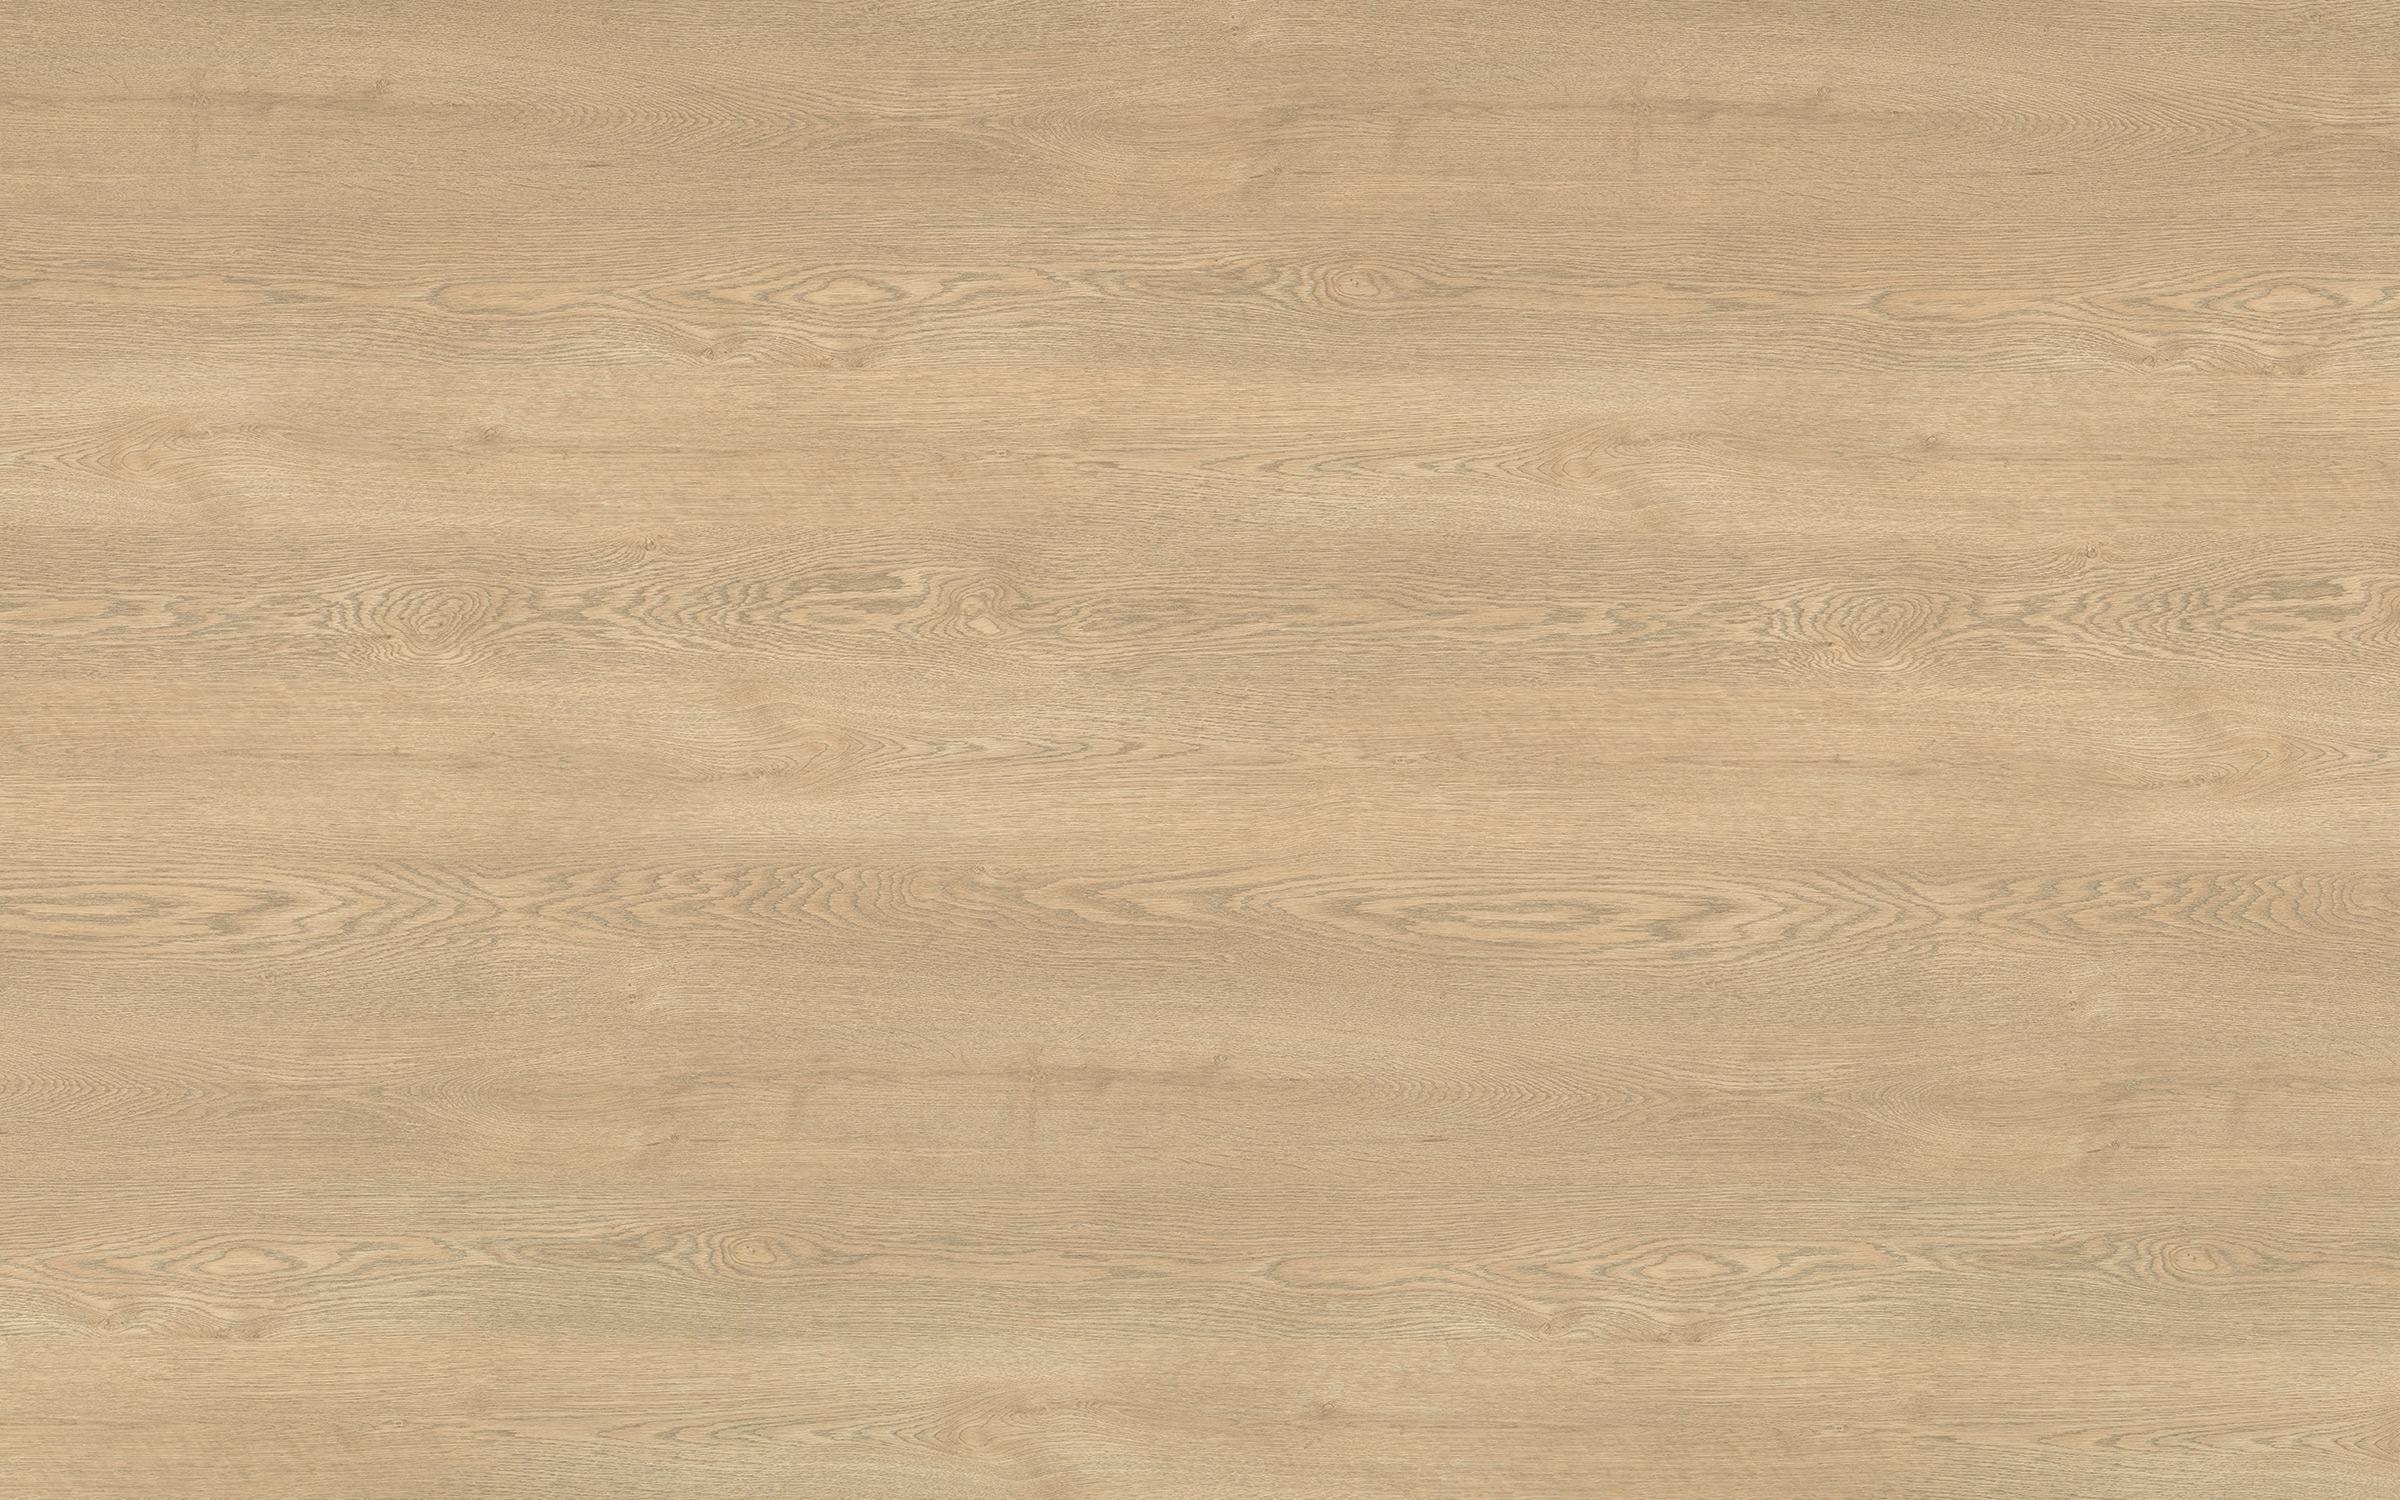 High Pressure Laminate Ruskin Oak 17001, Wilsonart Light Rustic Oak Laminate Flooring